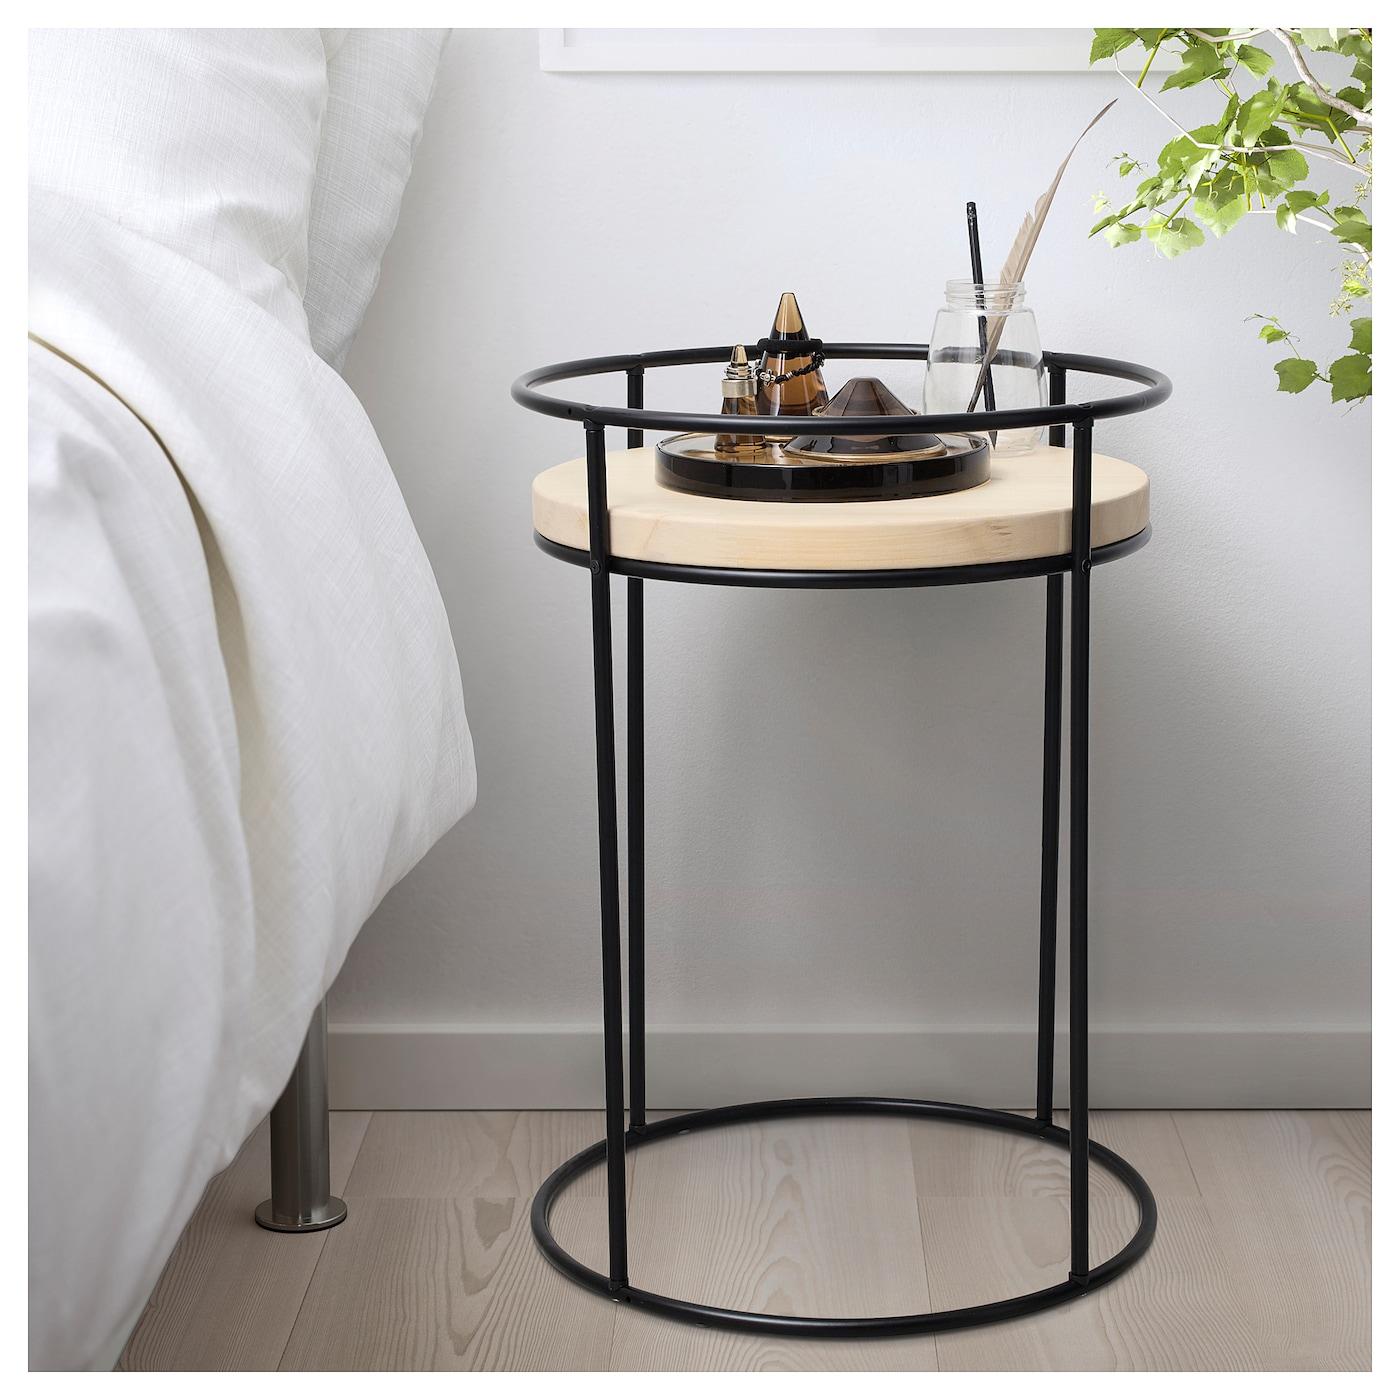 hj rtelig table de chevet pin noir 45 cm ikea. Black Bedroom Furniture Sets. Home Design Ideas